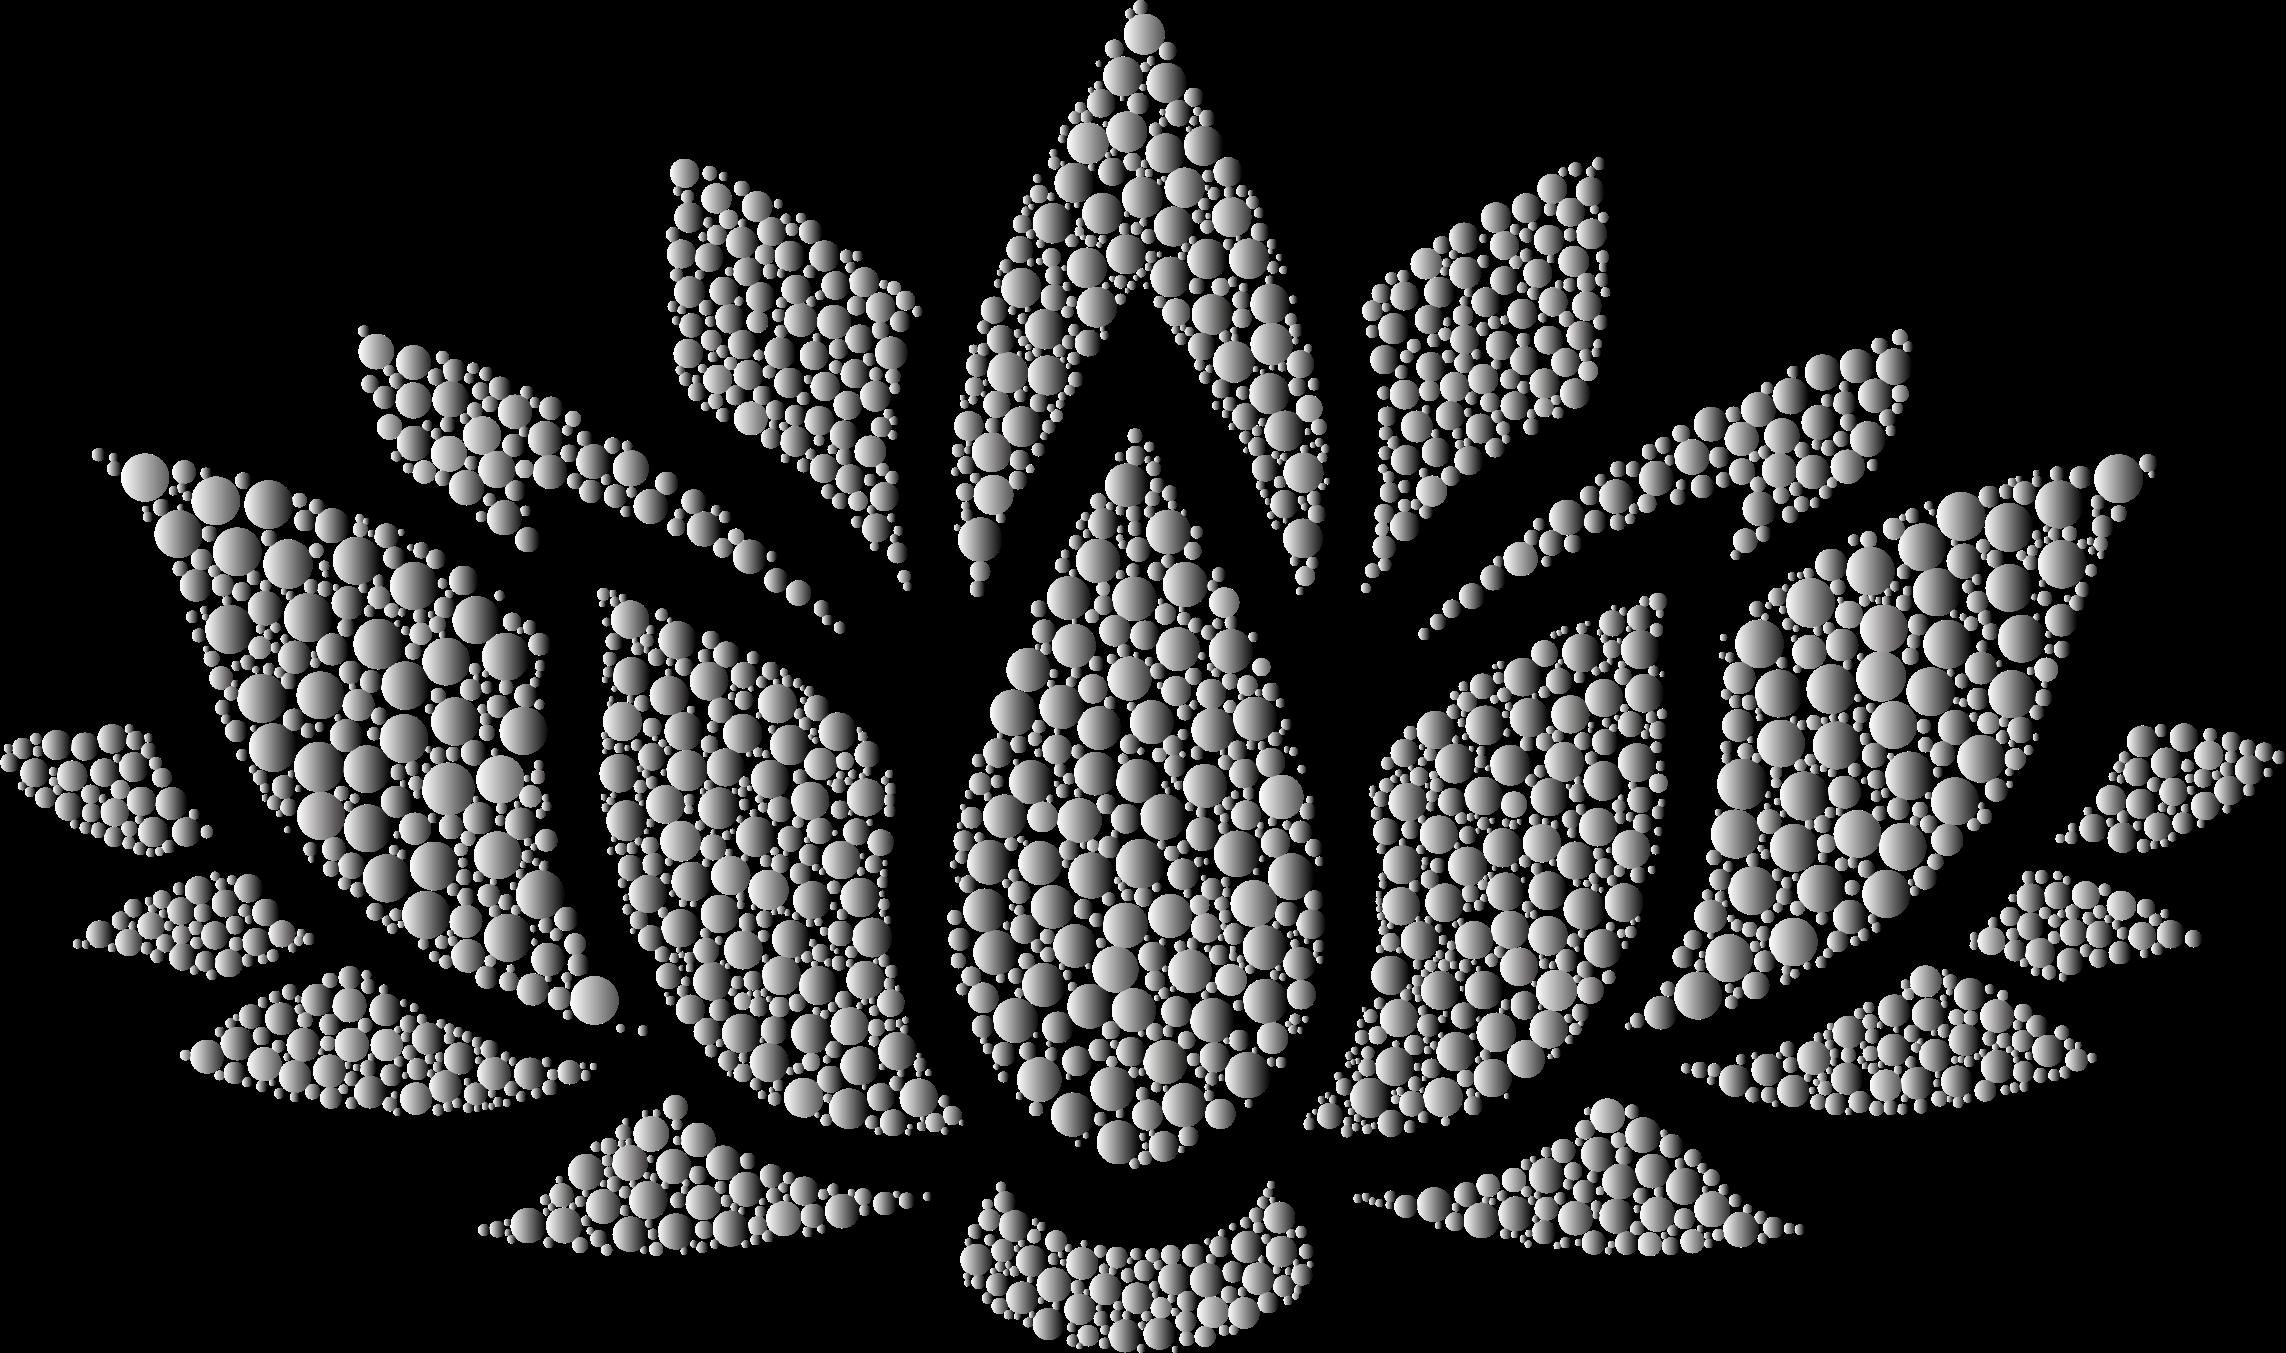 White lotus flower clipart clip black and white stock Clipart - Prismatic Lotus Flower Silhouette 6 Circles 10 No Background clip black and white stock